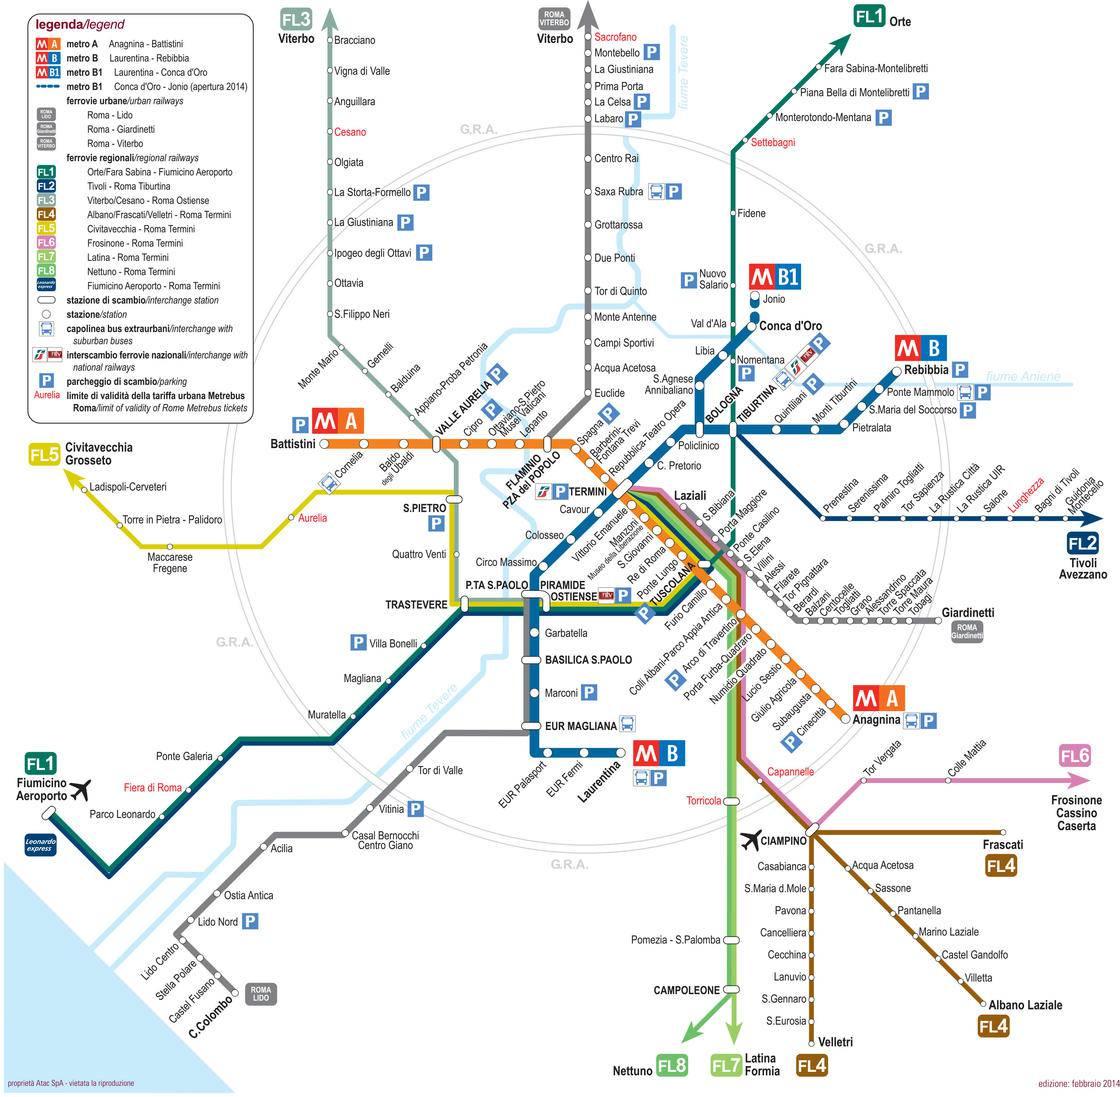 Carte du train de banlieu de Rome